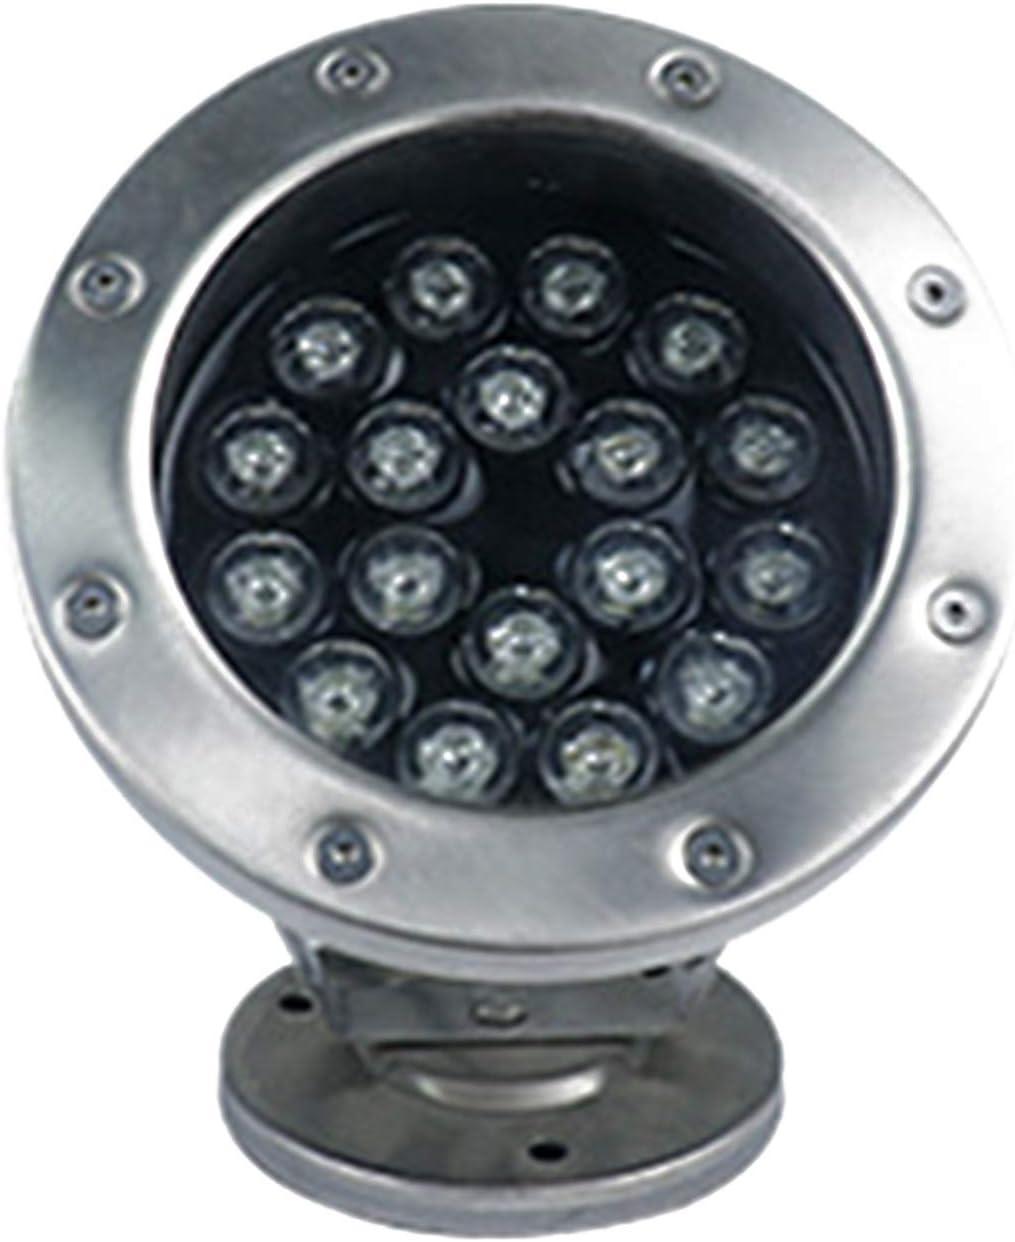 Brand Sale SALE% OFF Cheap Sale Venue LED Underwater Light Custom 24V Waterproof High IP68 Brightness